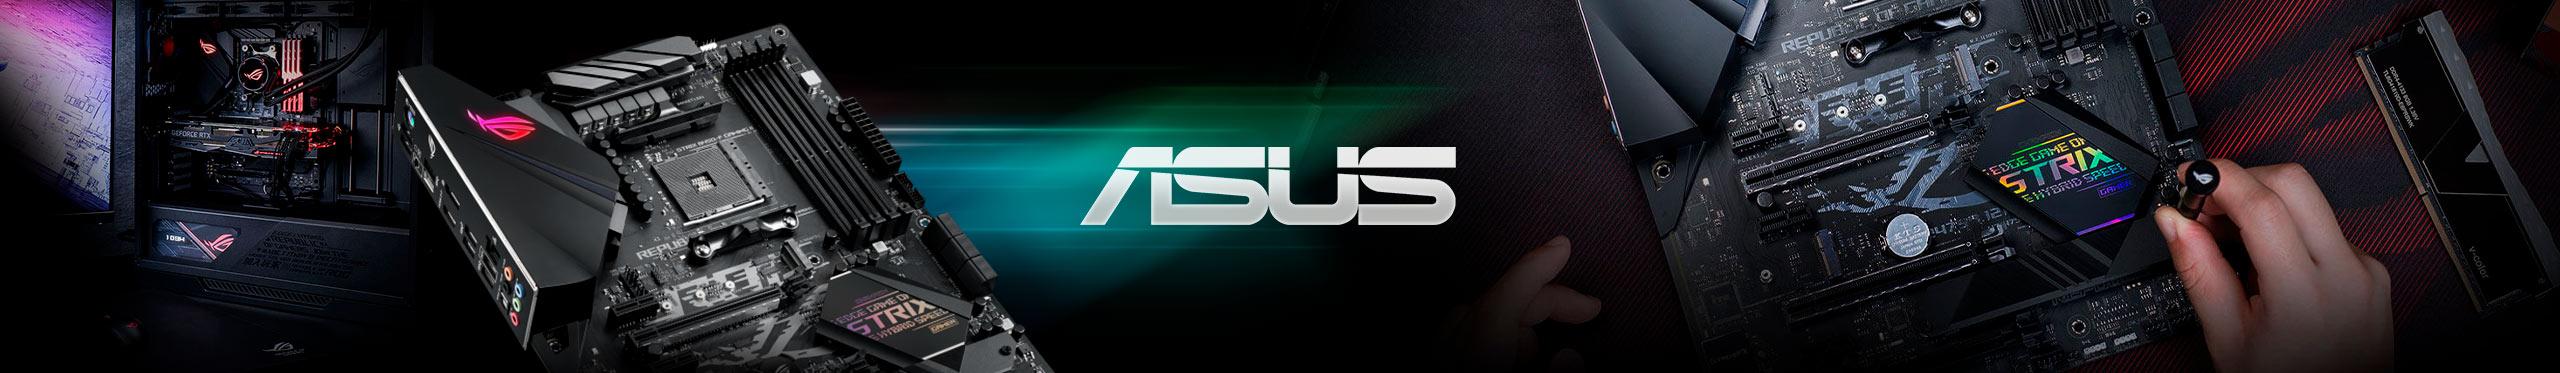 ASUS - STRIX